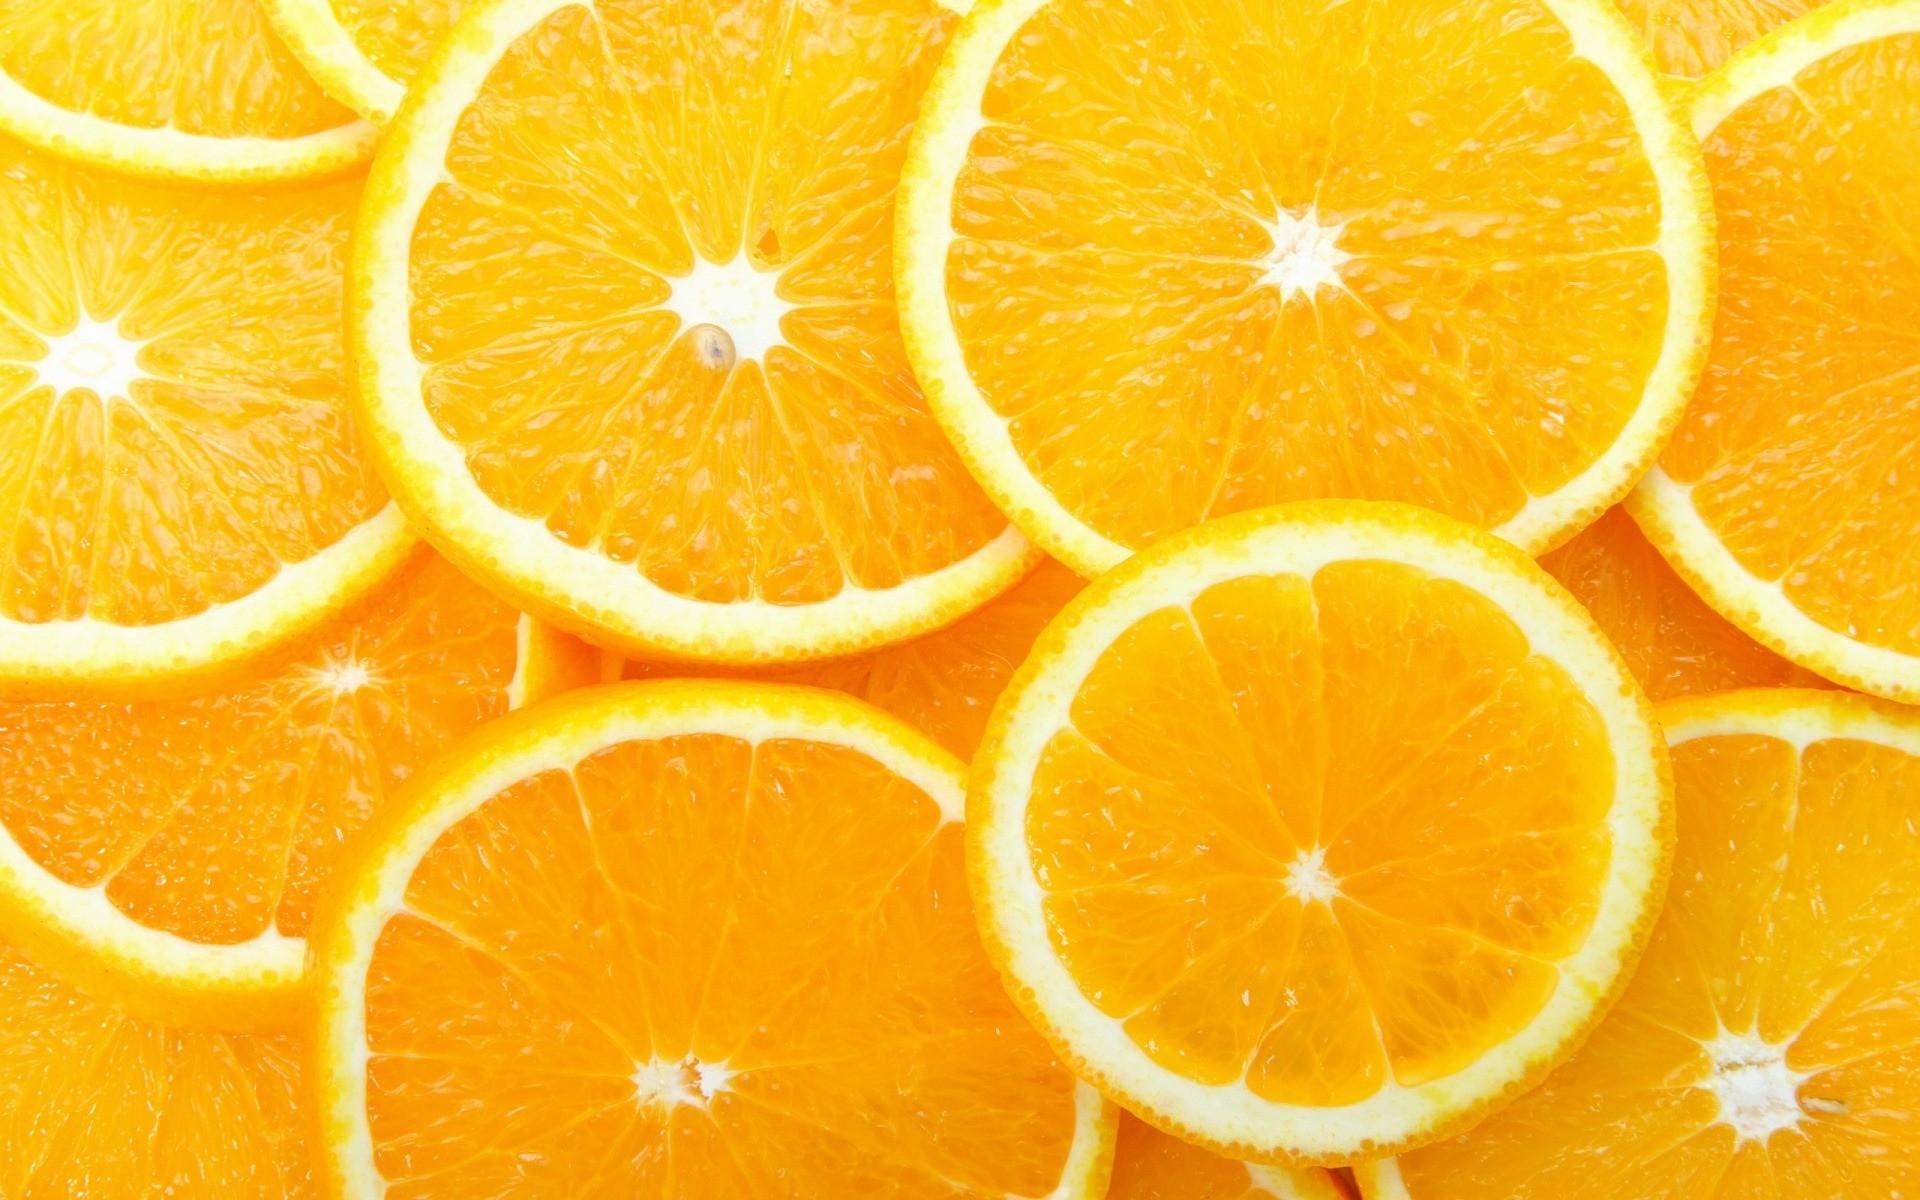 Res: 1920x1200, Orange Slices Wallpaper Fruits Nature